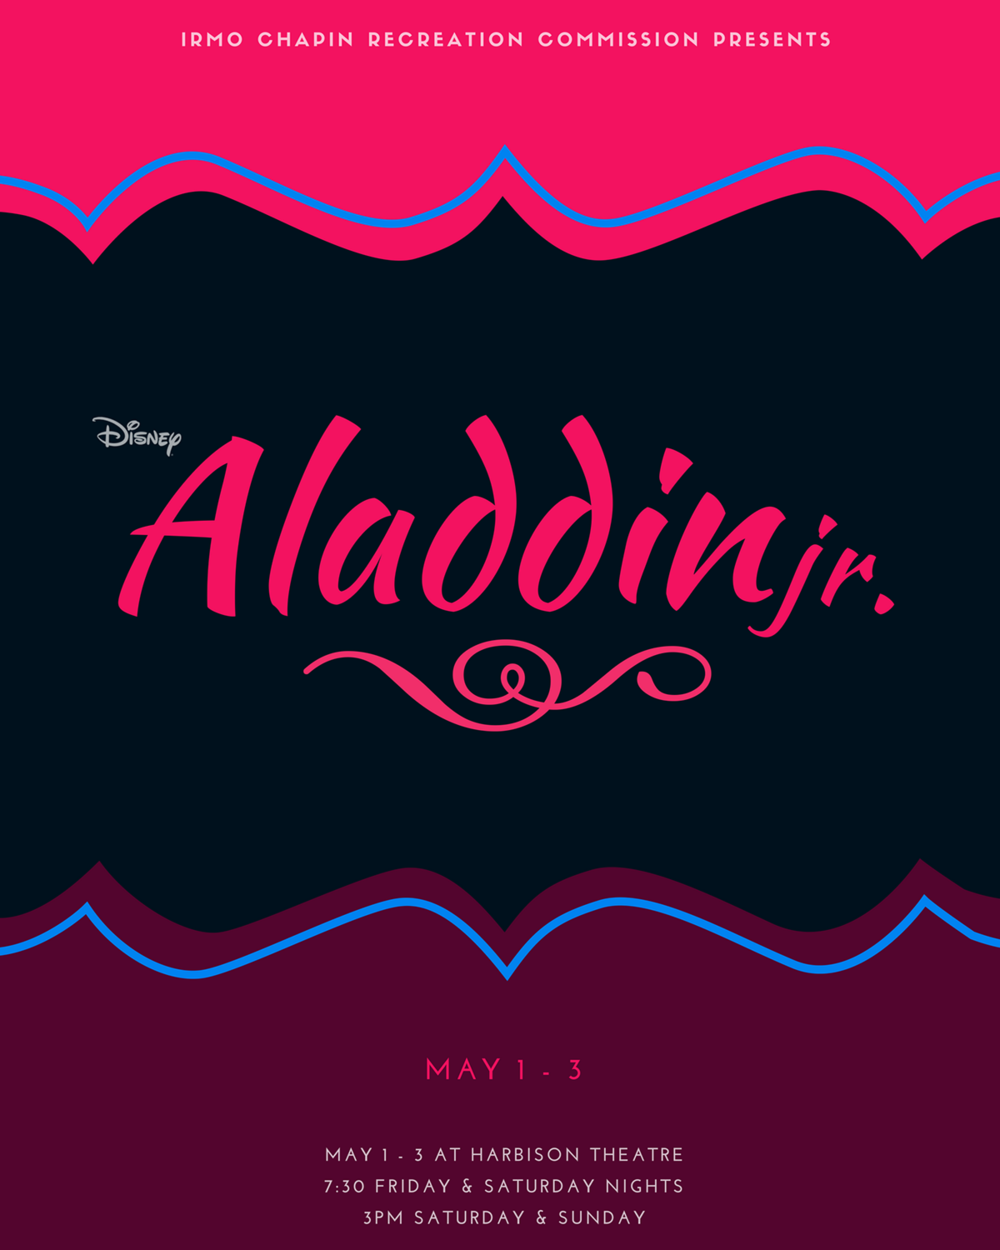 aladdin-jr-poster-design